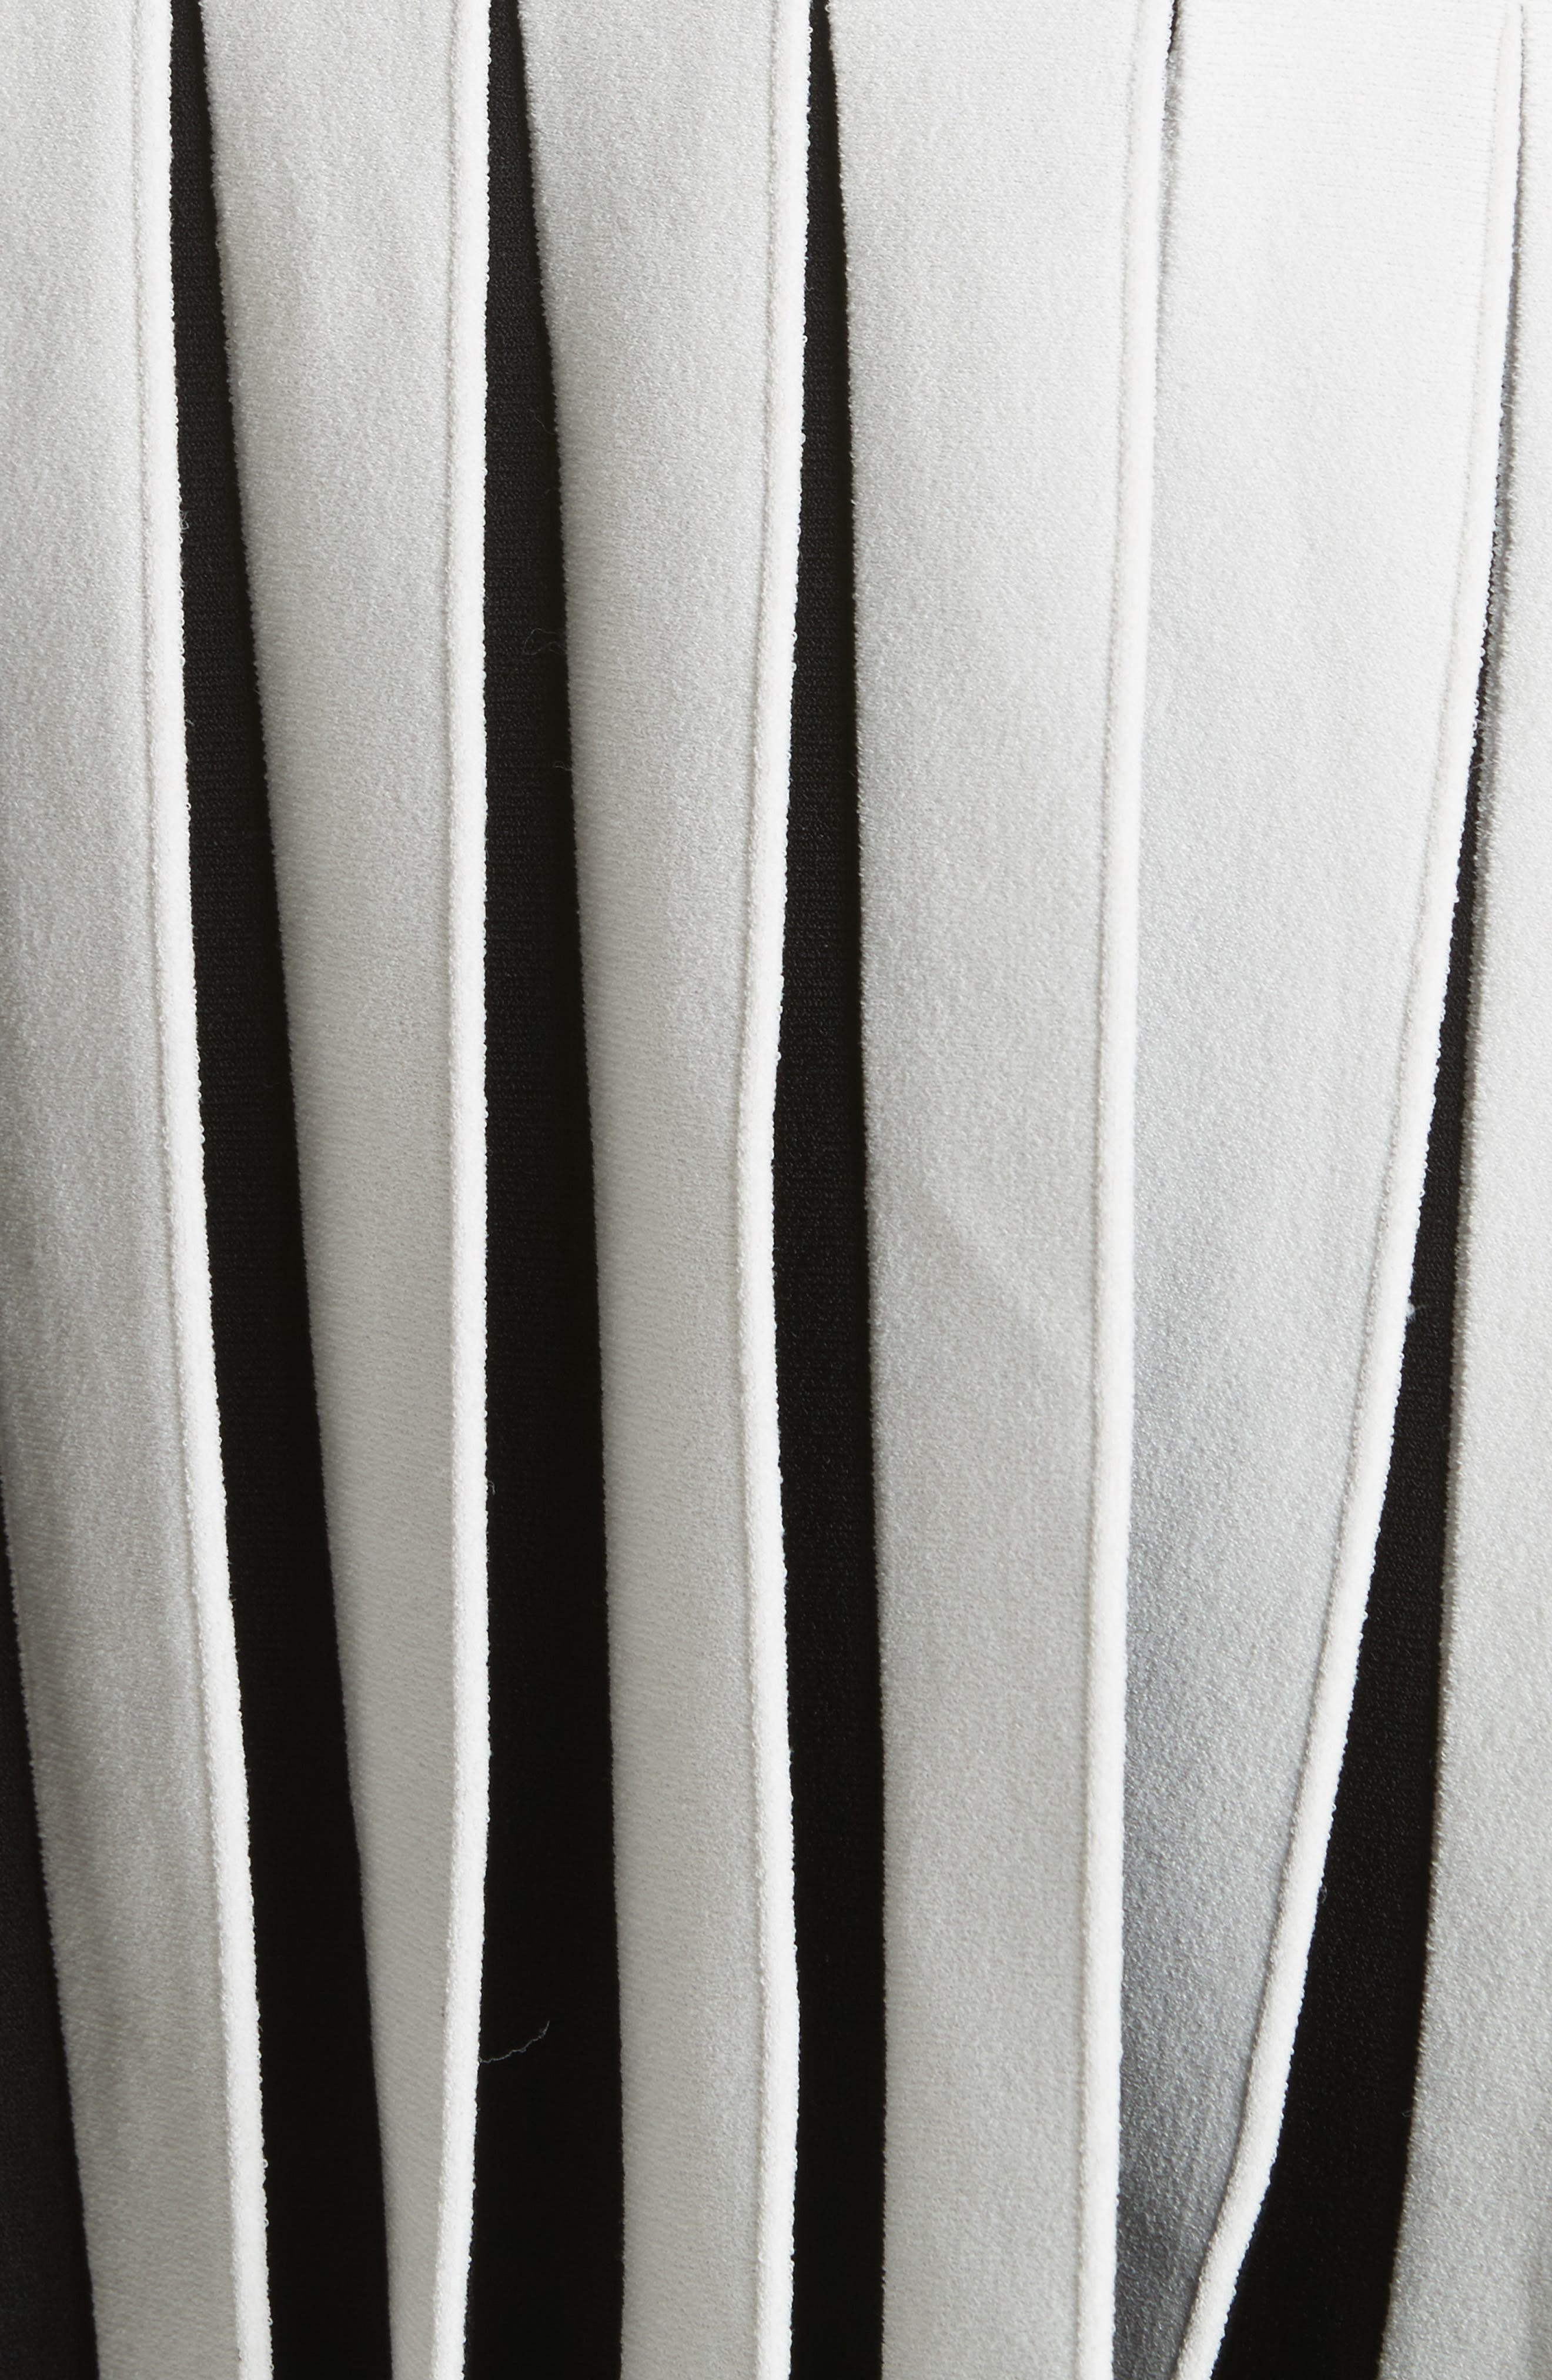 Pleated Contrast Drop Waist Dress,                             Alternate thumbnail 5, color,                             White/ Black